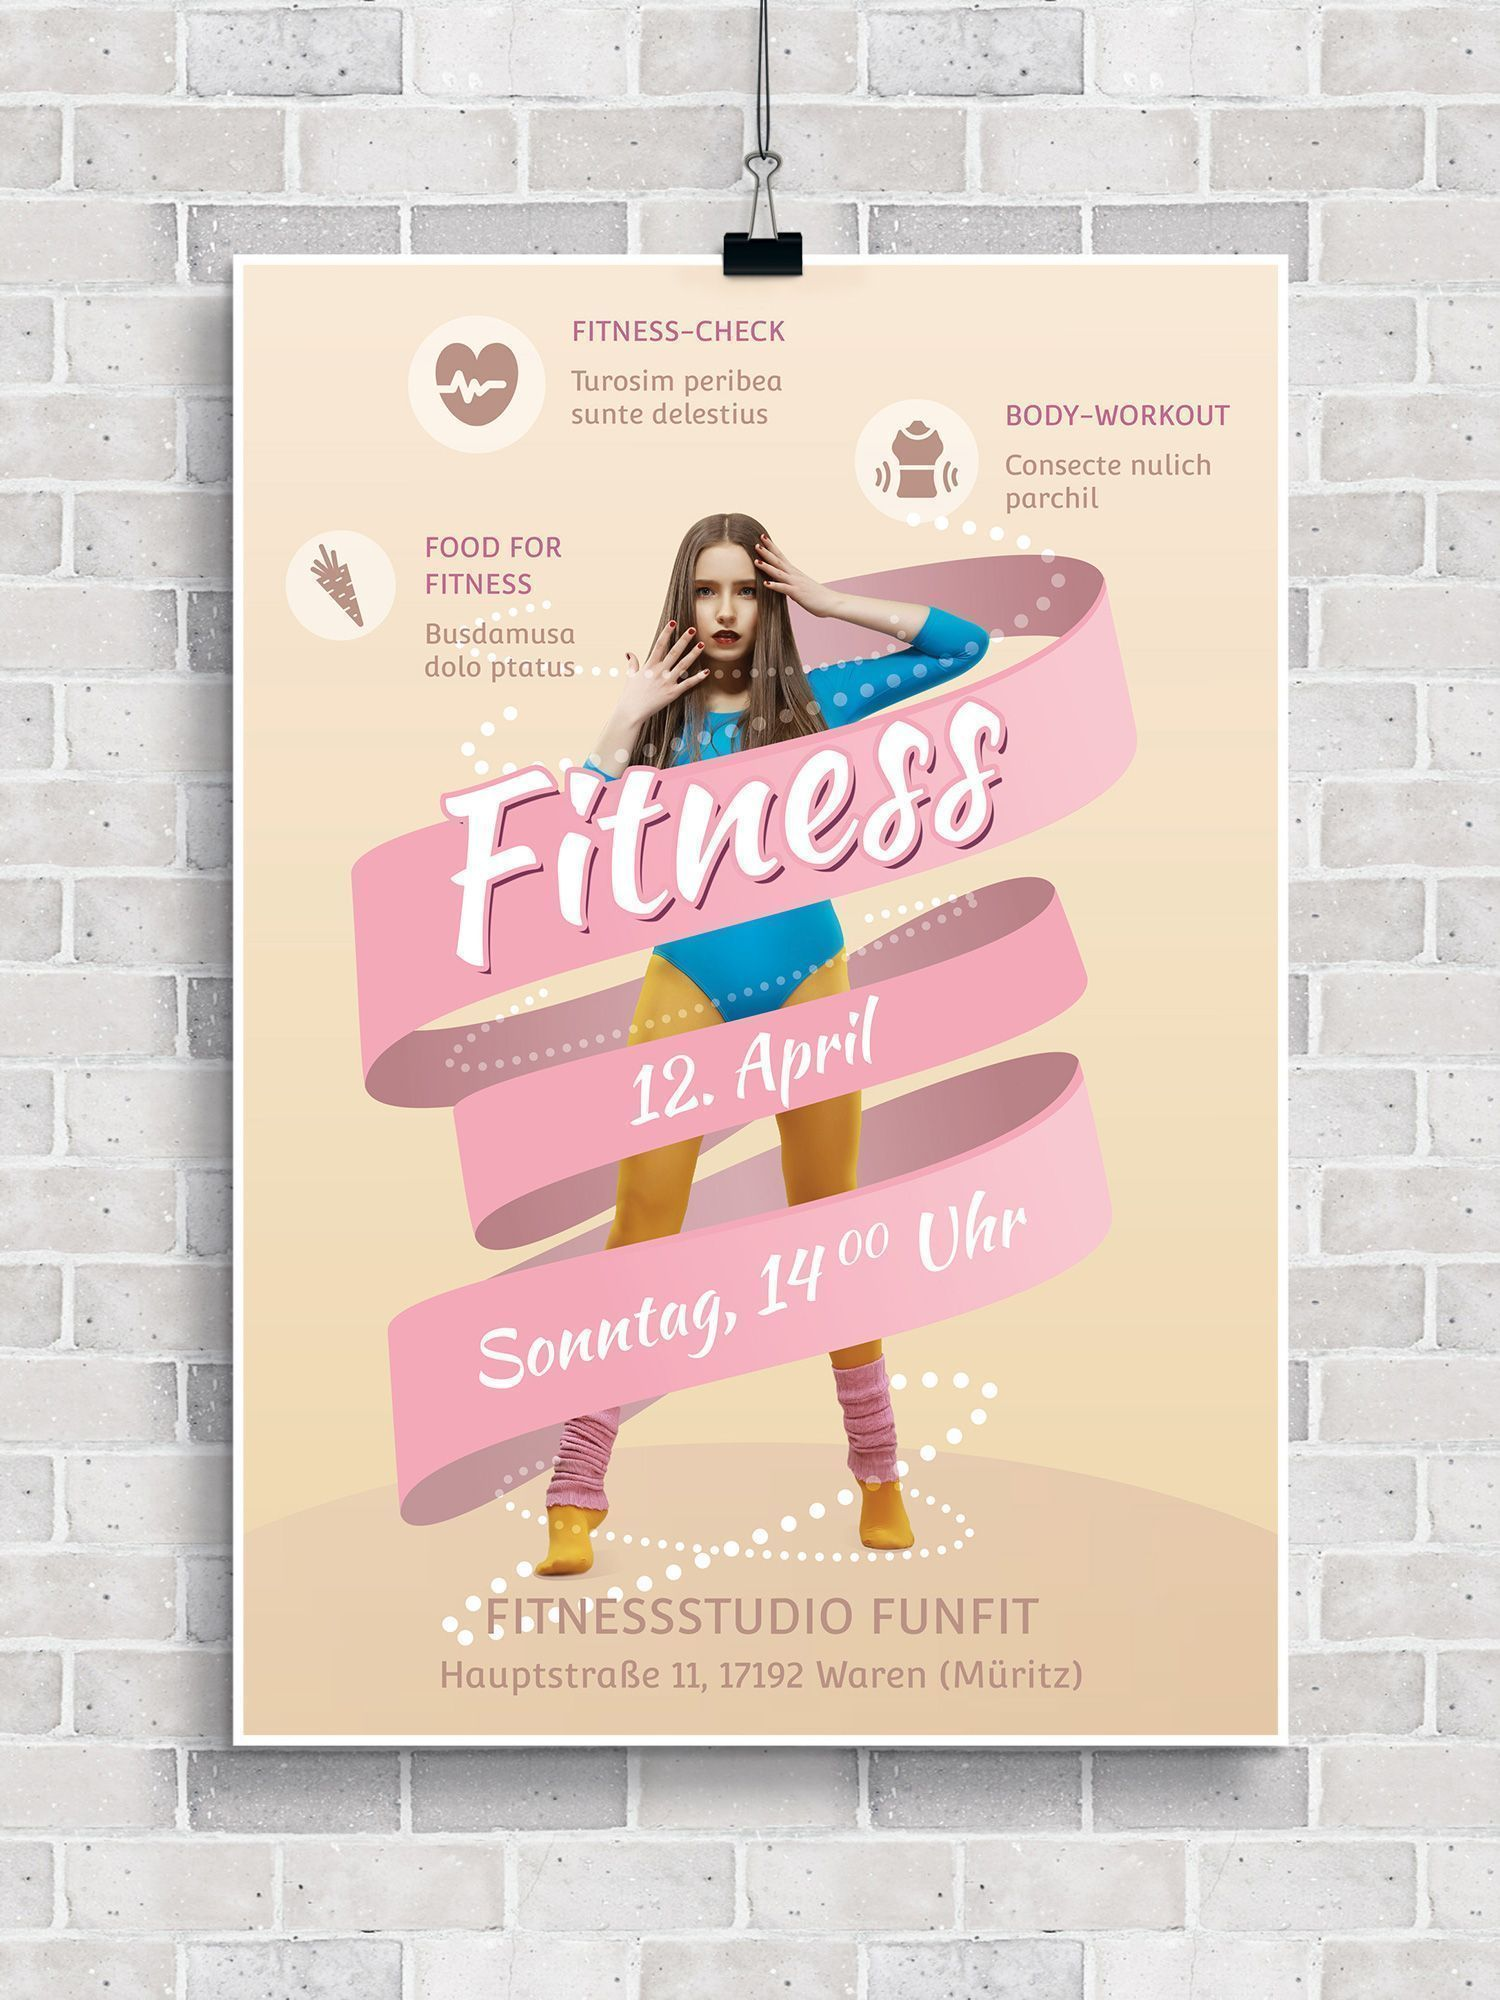 #fitness #fitnessstudio #Fitnessstudios #FlyerVorla #probetraining #probetraining fitnessstudio #fit...